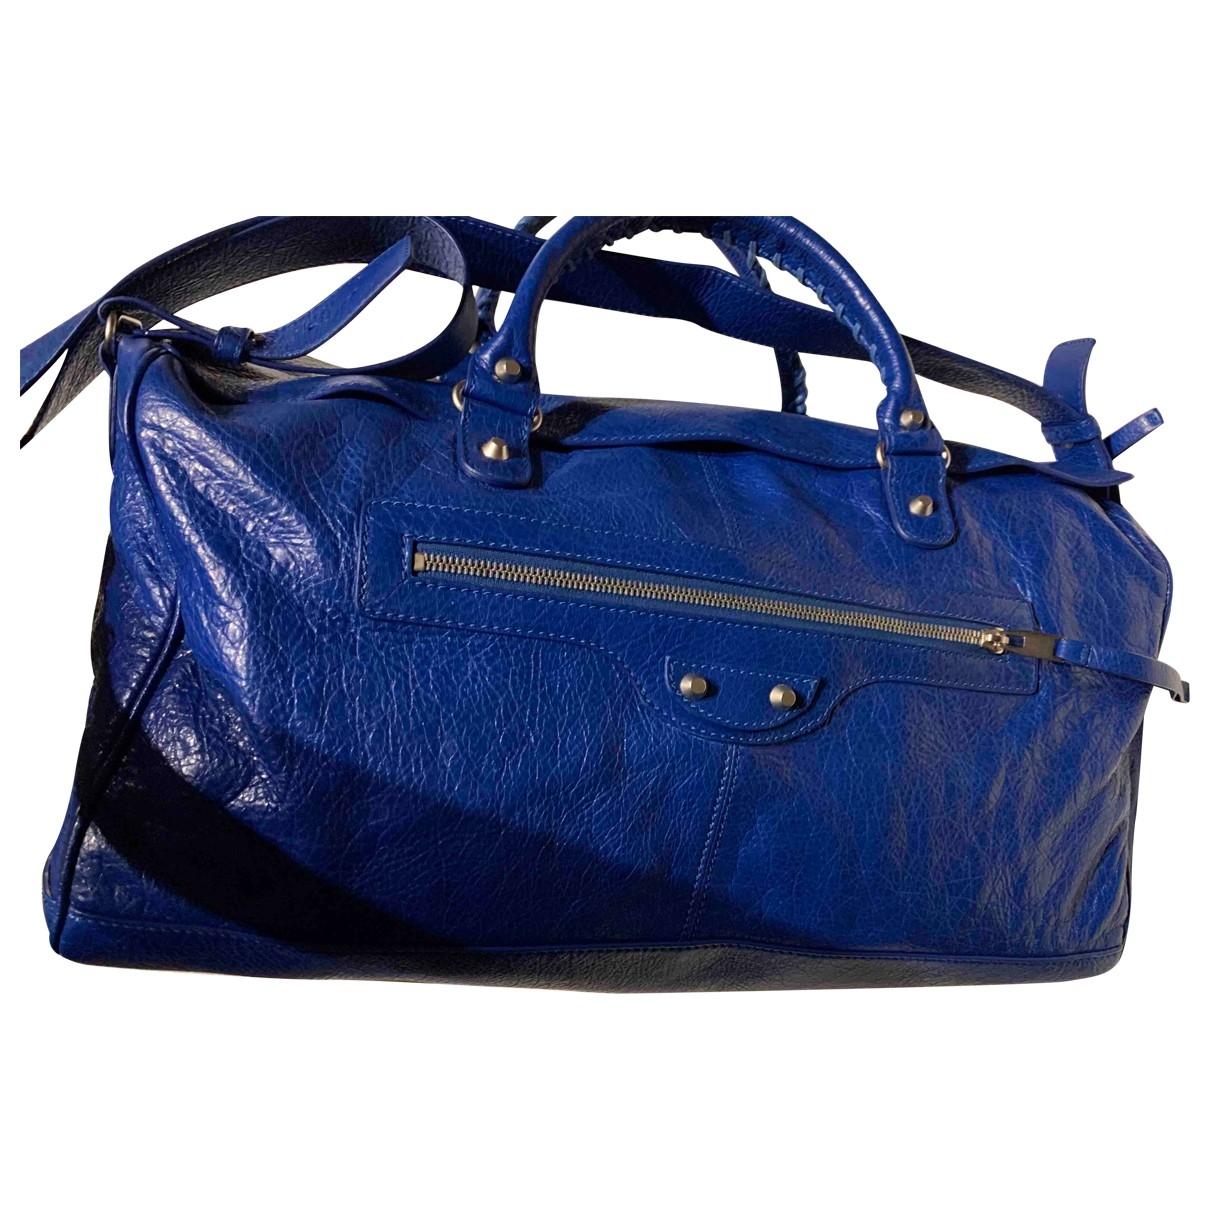 Balenciaga \N Blue Leather bag for Men \N